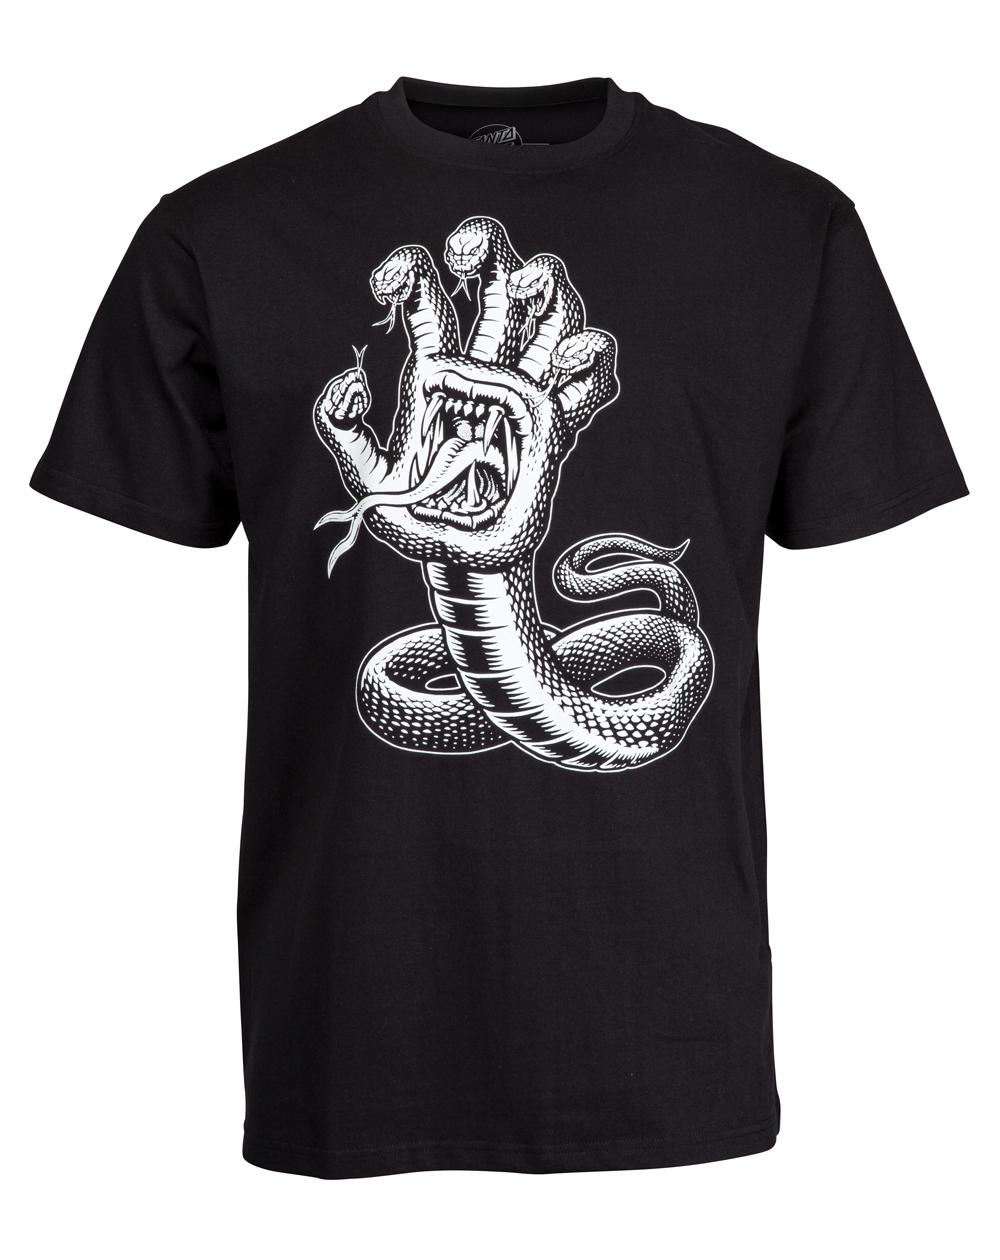 Santa Cruz Herren T-Shirt Hissing Hand Black